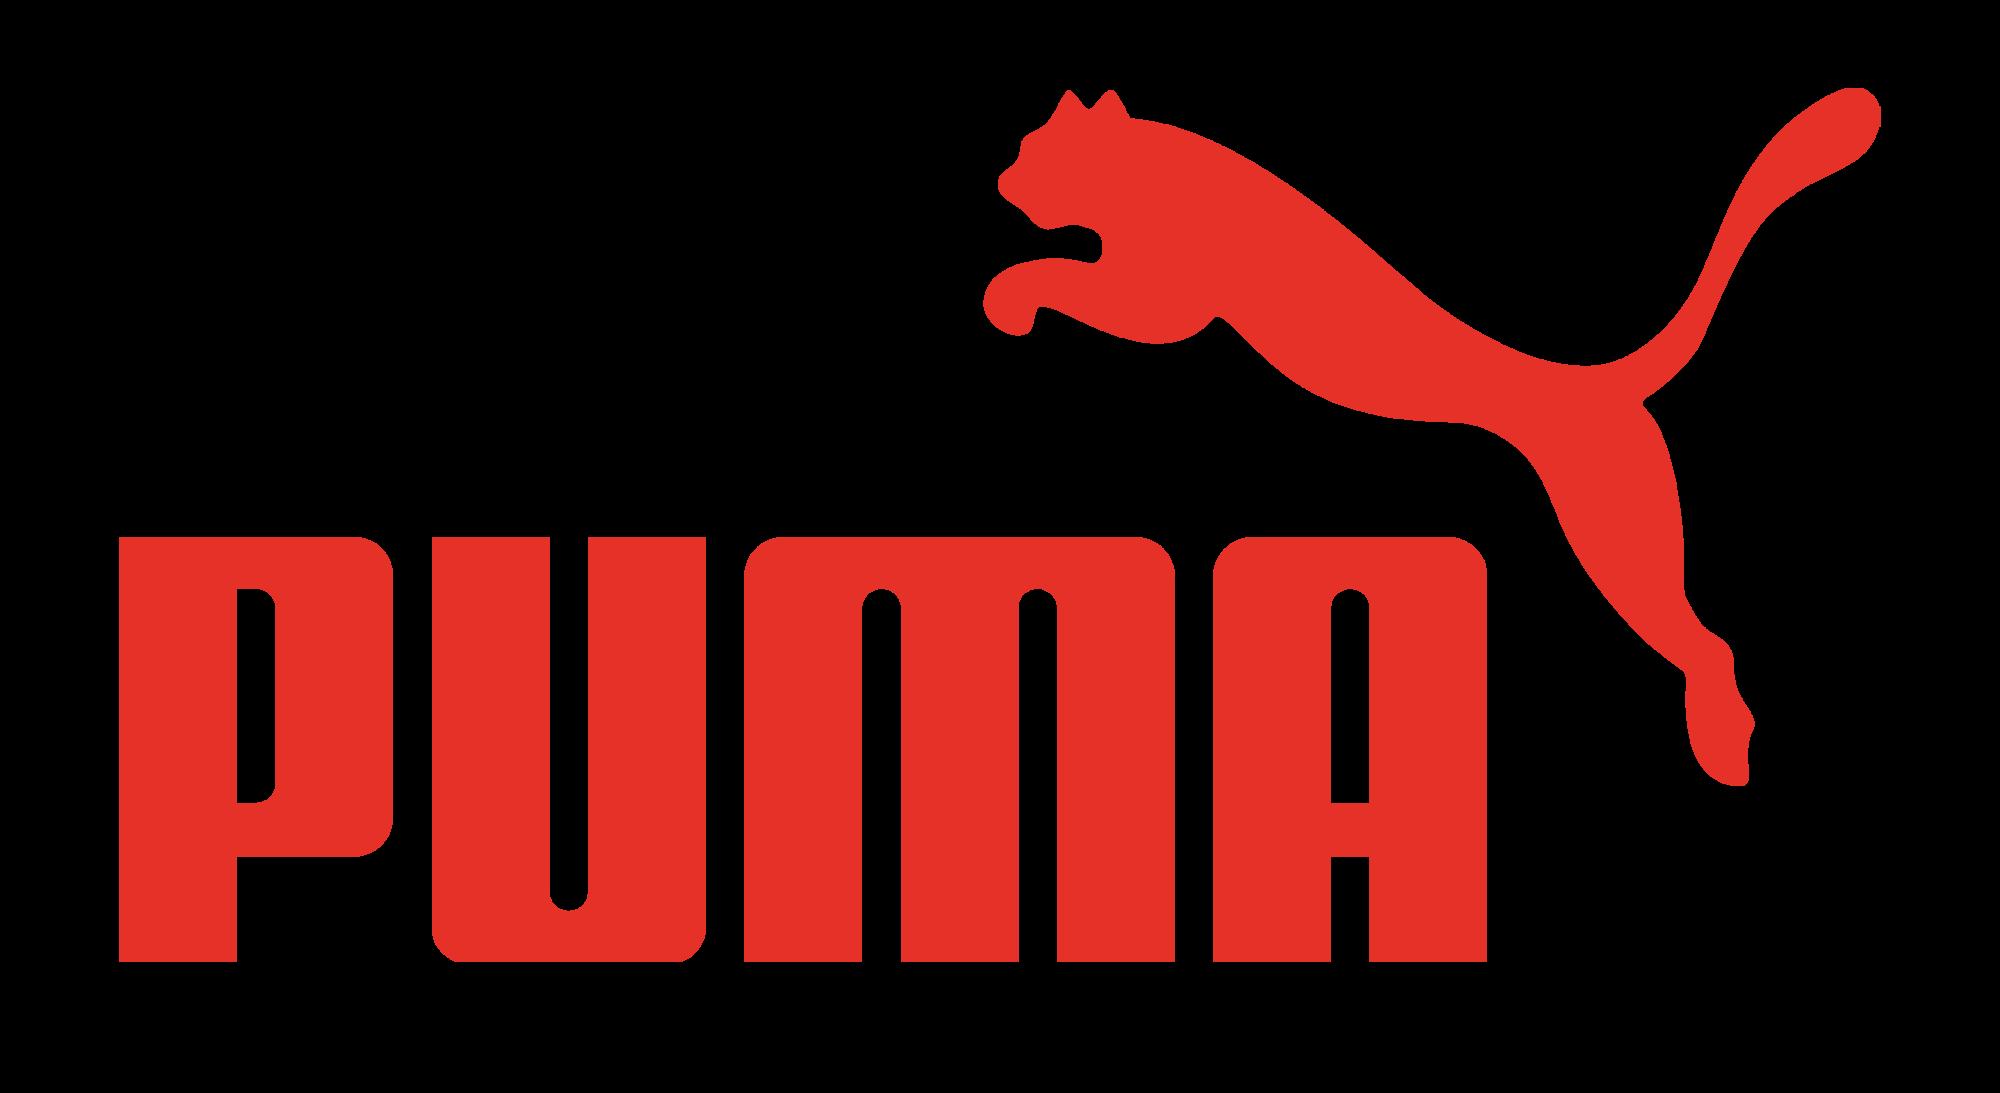 Logotipo de Puma